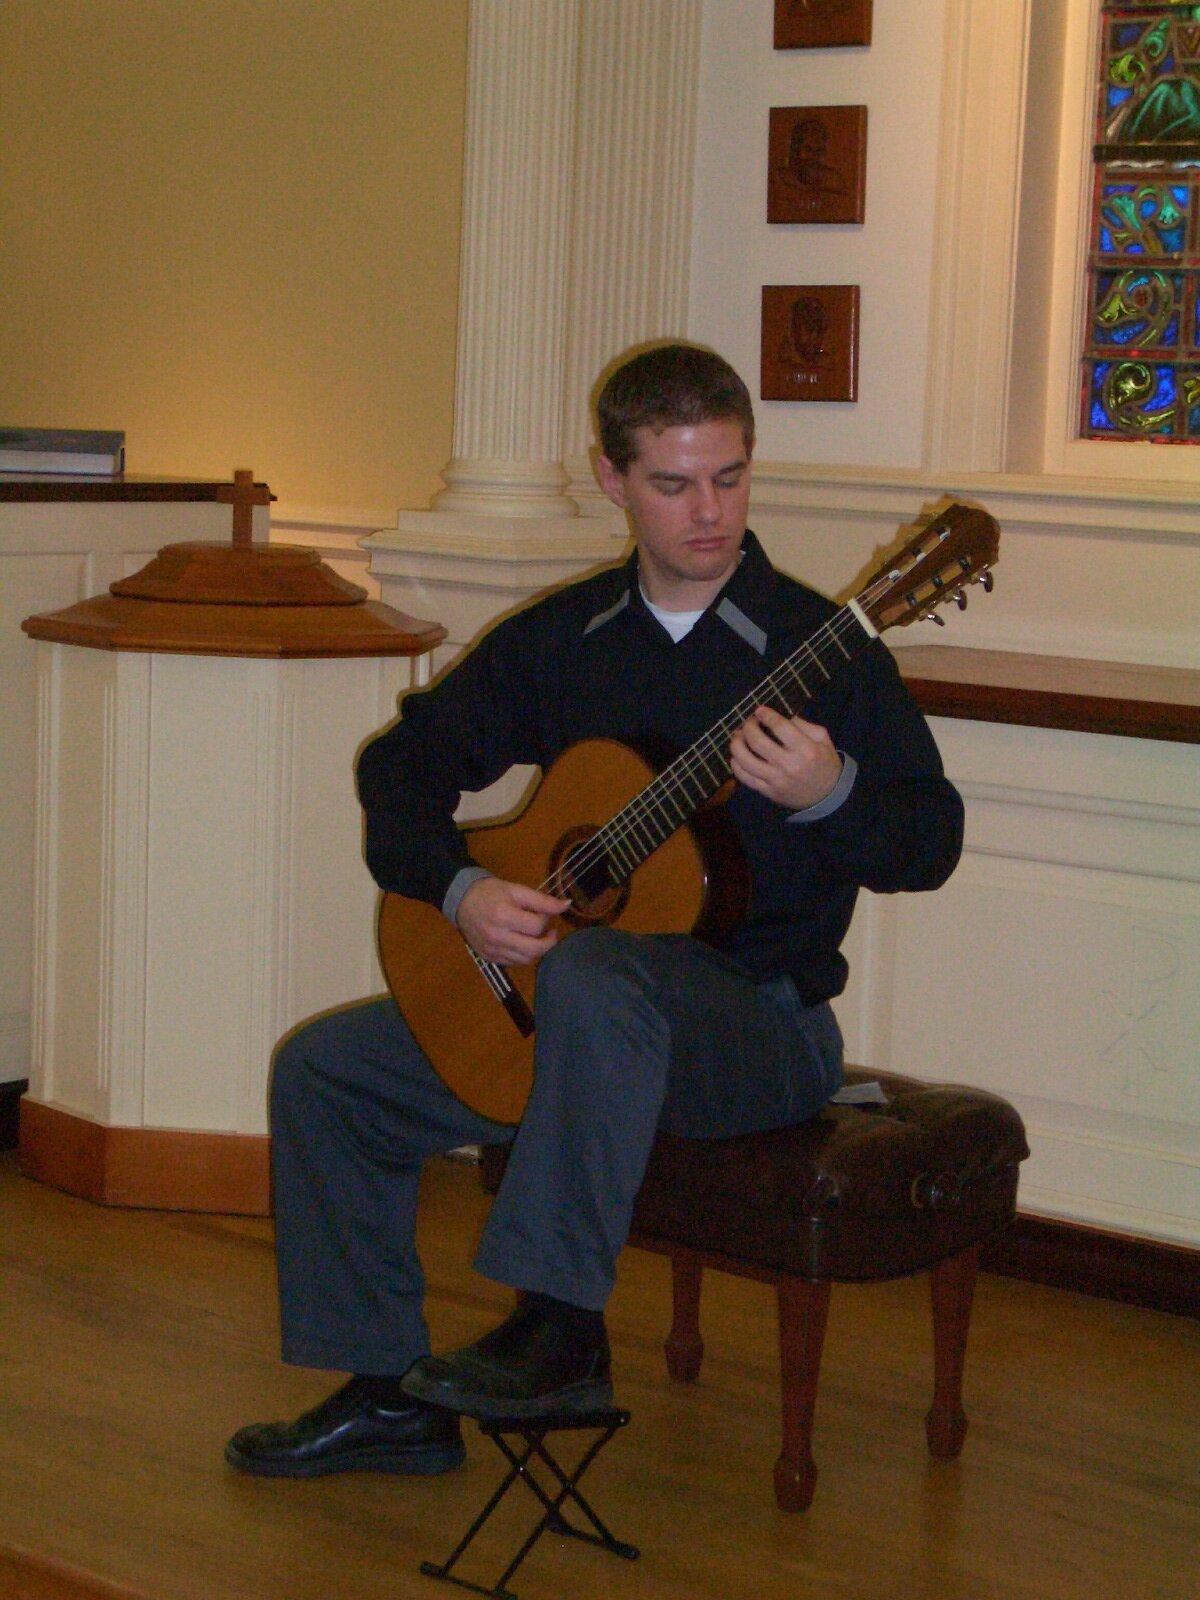 From Senior Recital tour, Presbyterian College, SC (many thanks to U Akron alum, James Buckland)